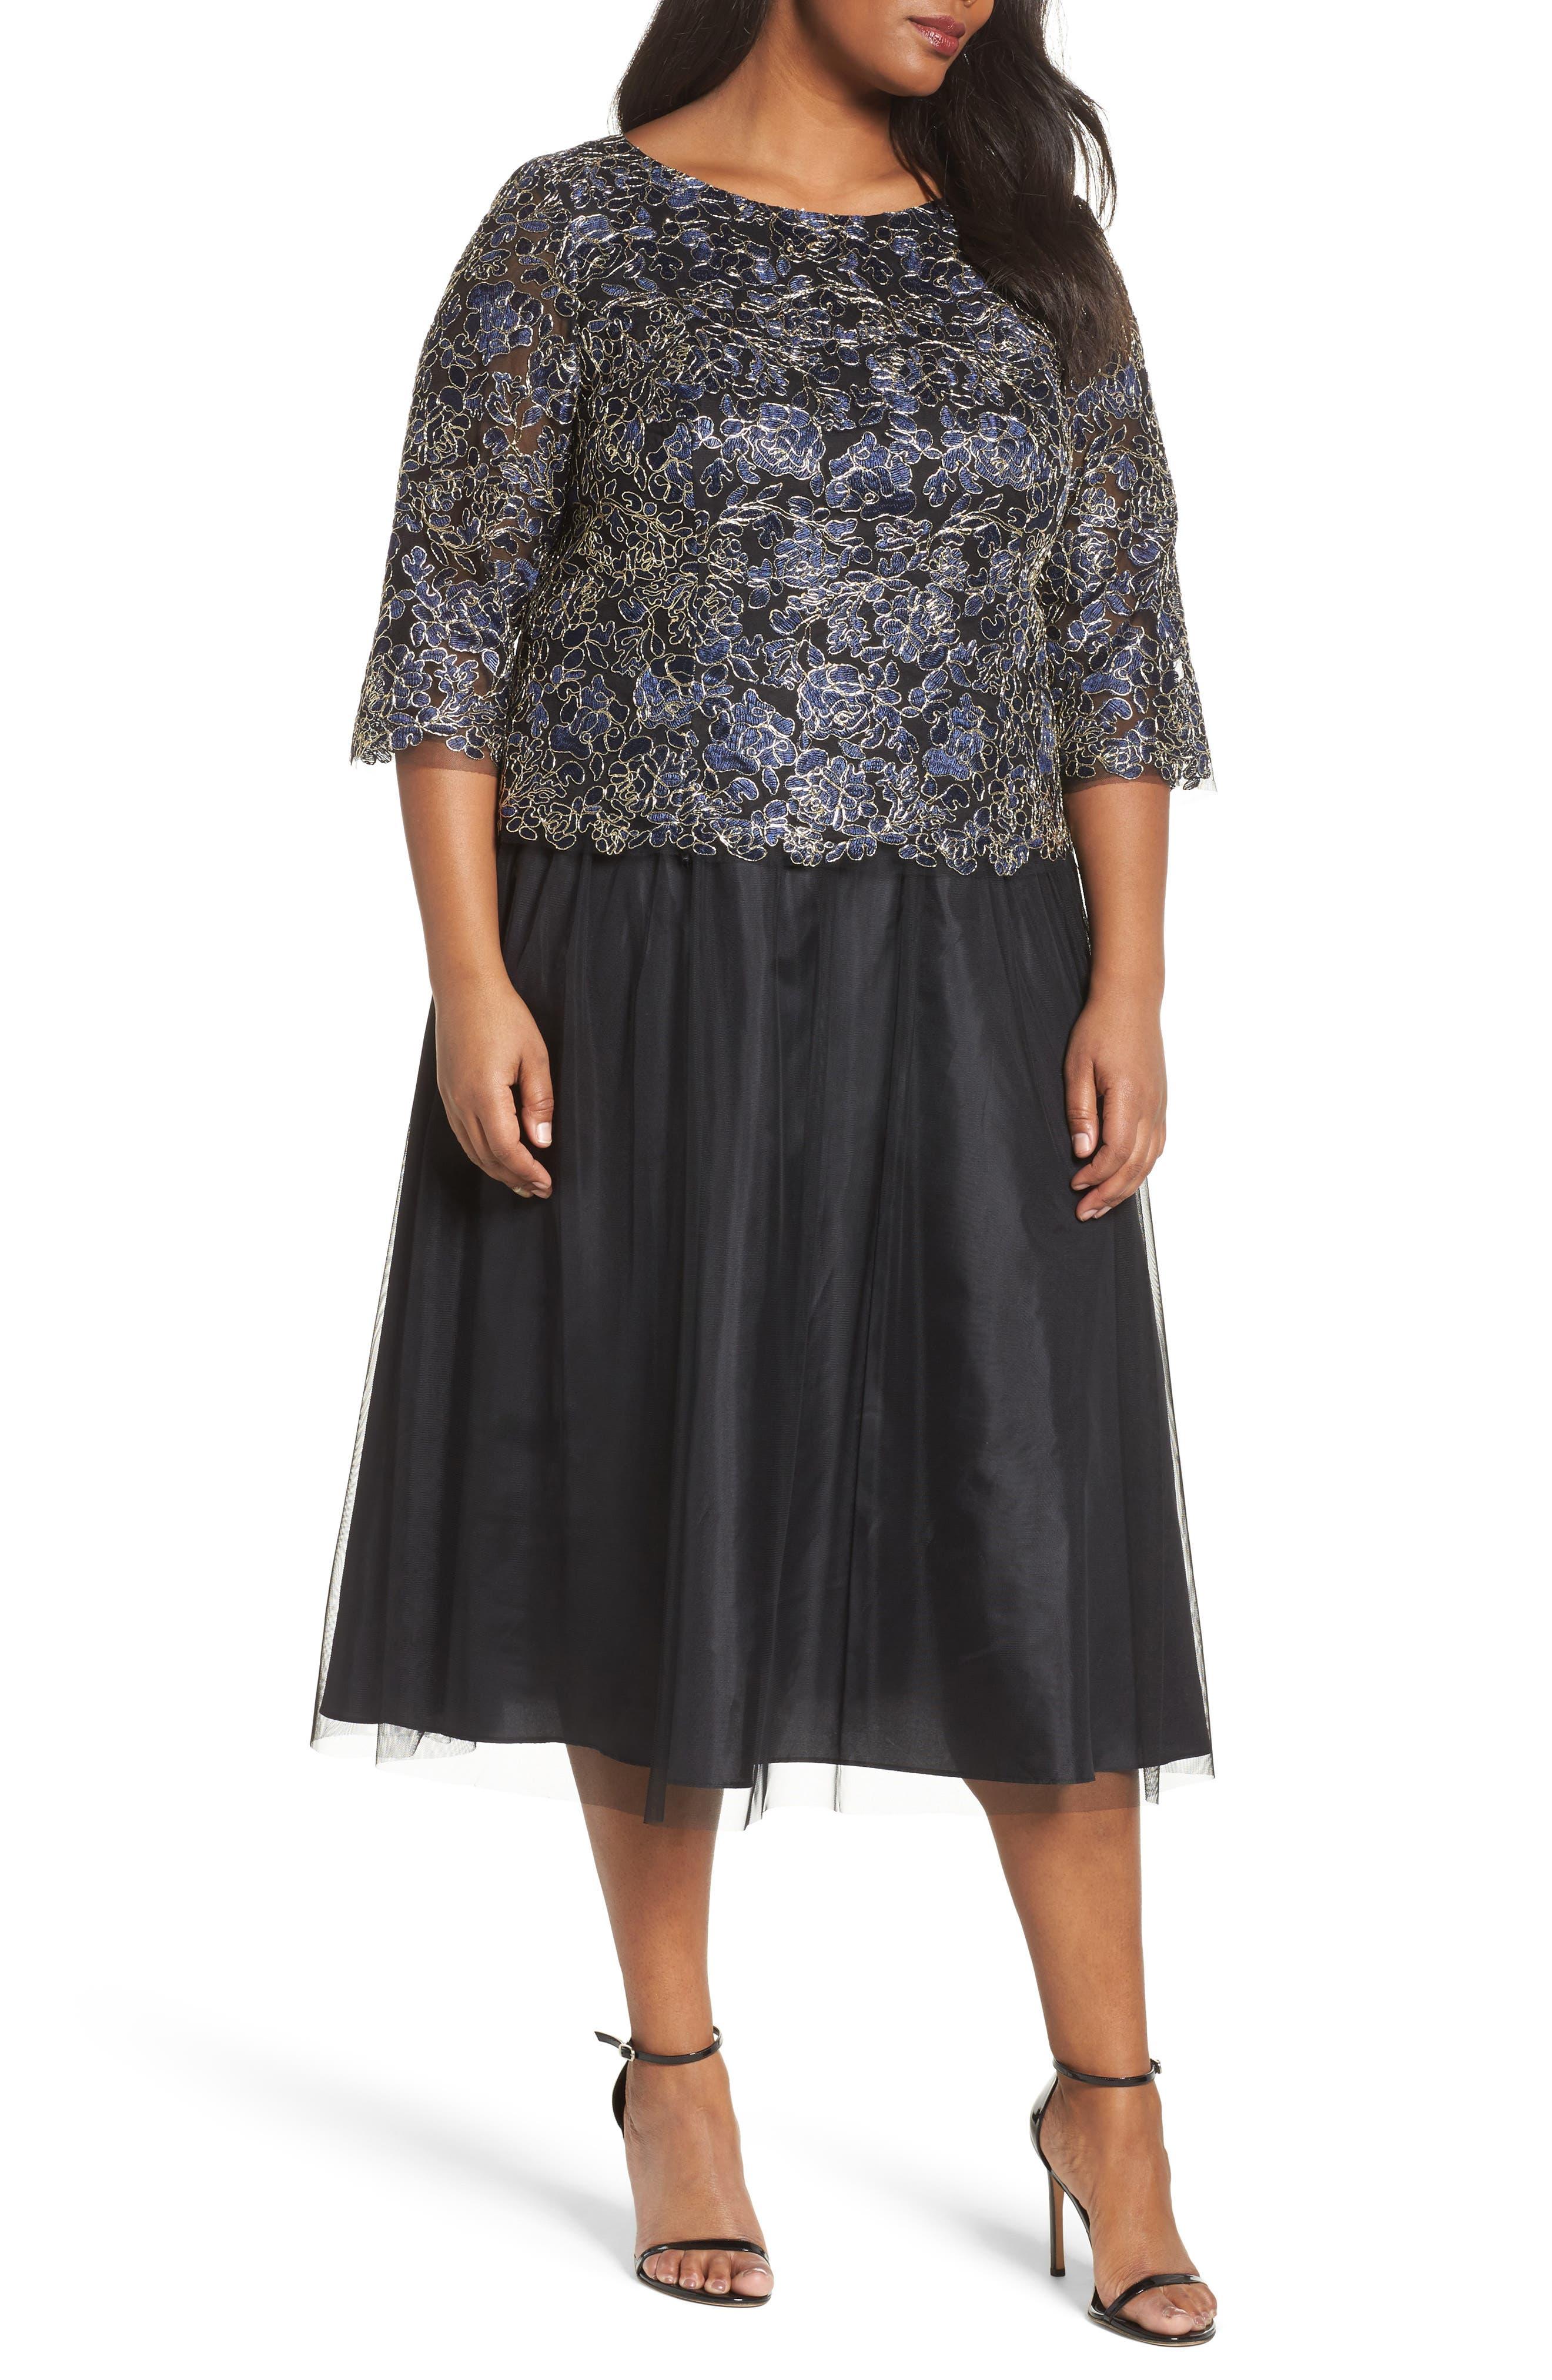 Main Image - Alex Evenings Tea Length Lace & Tulle Dress (Plus Size)